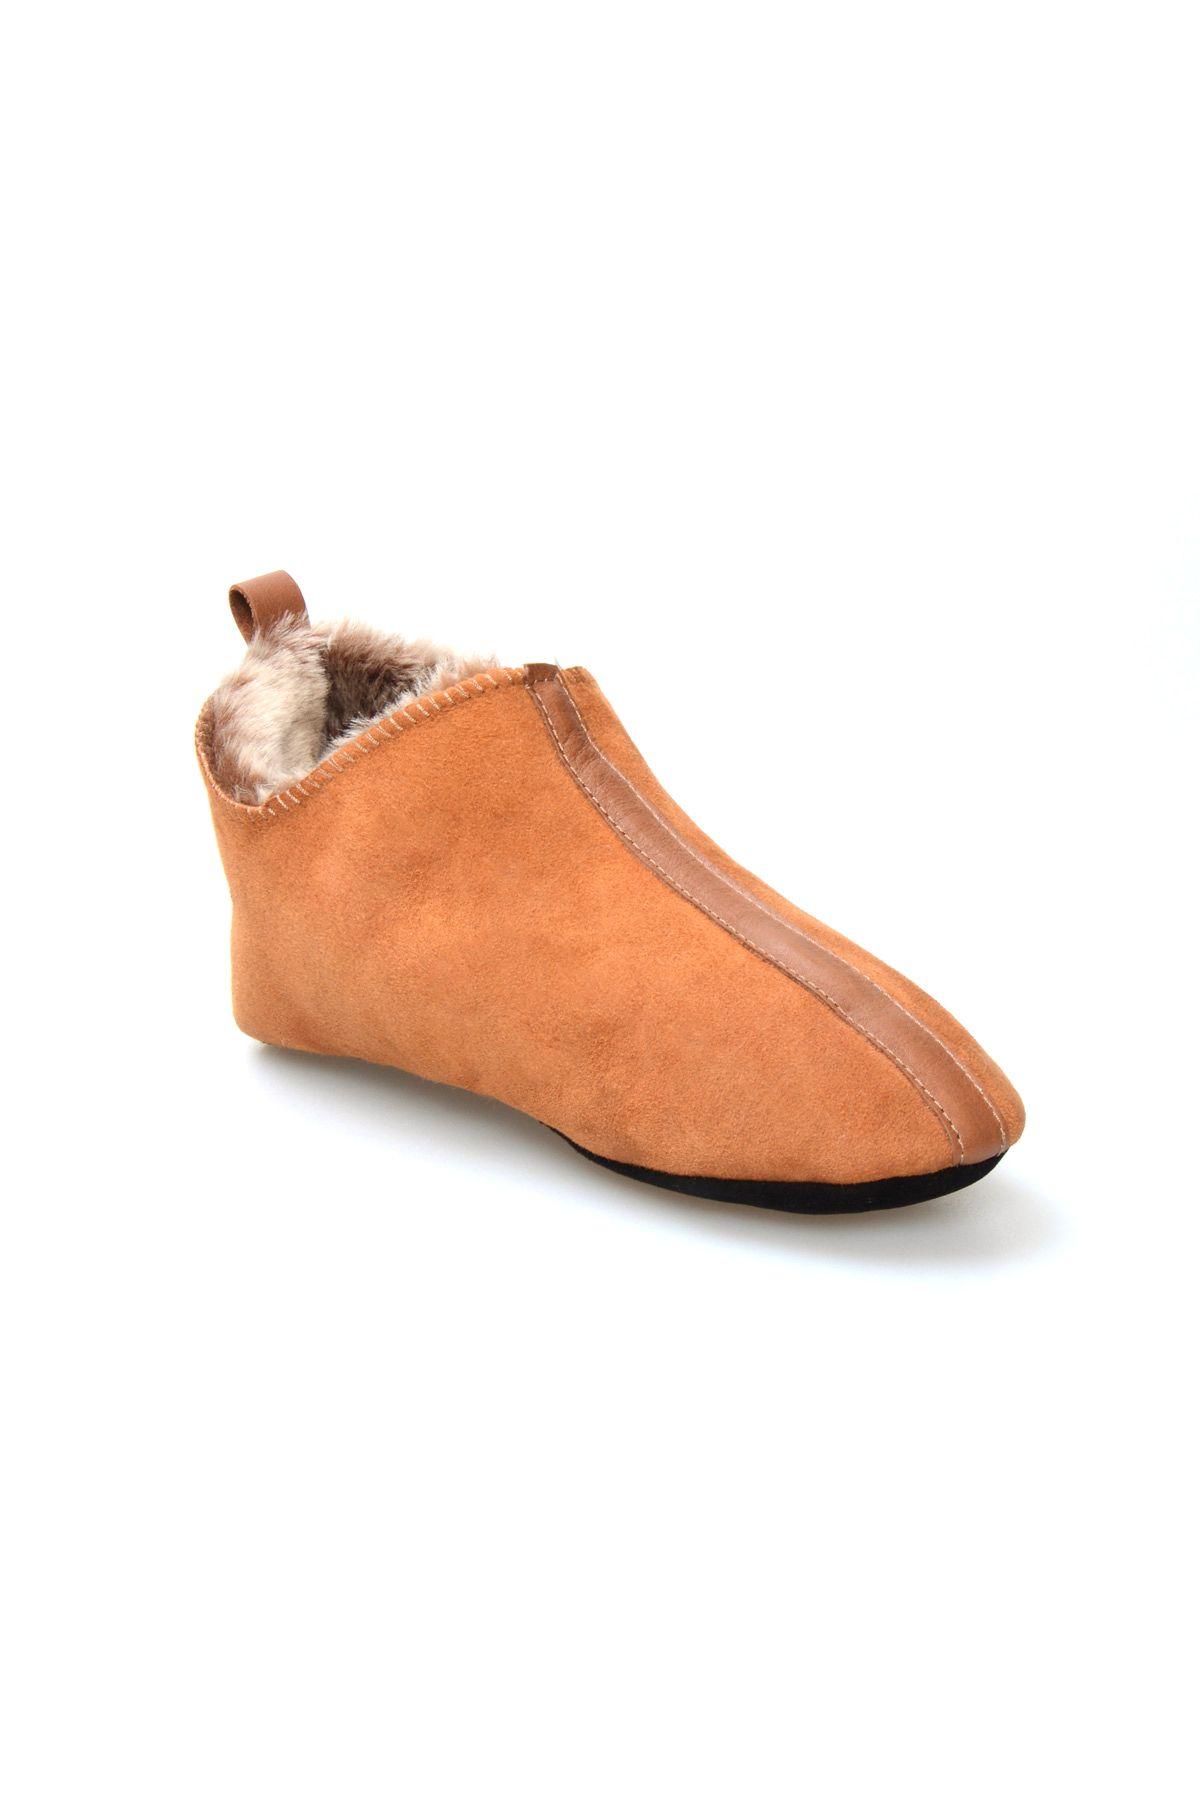 Pegia Genuine Suede Sheepskin Women Slipppers 980520 Ginger